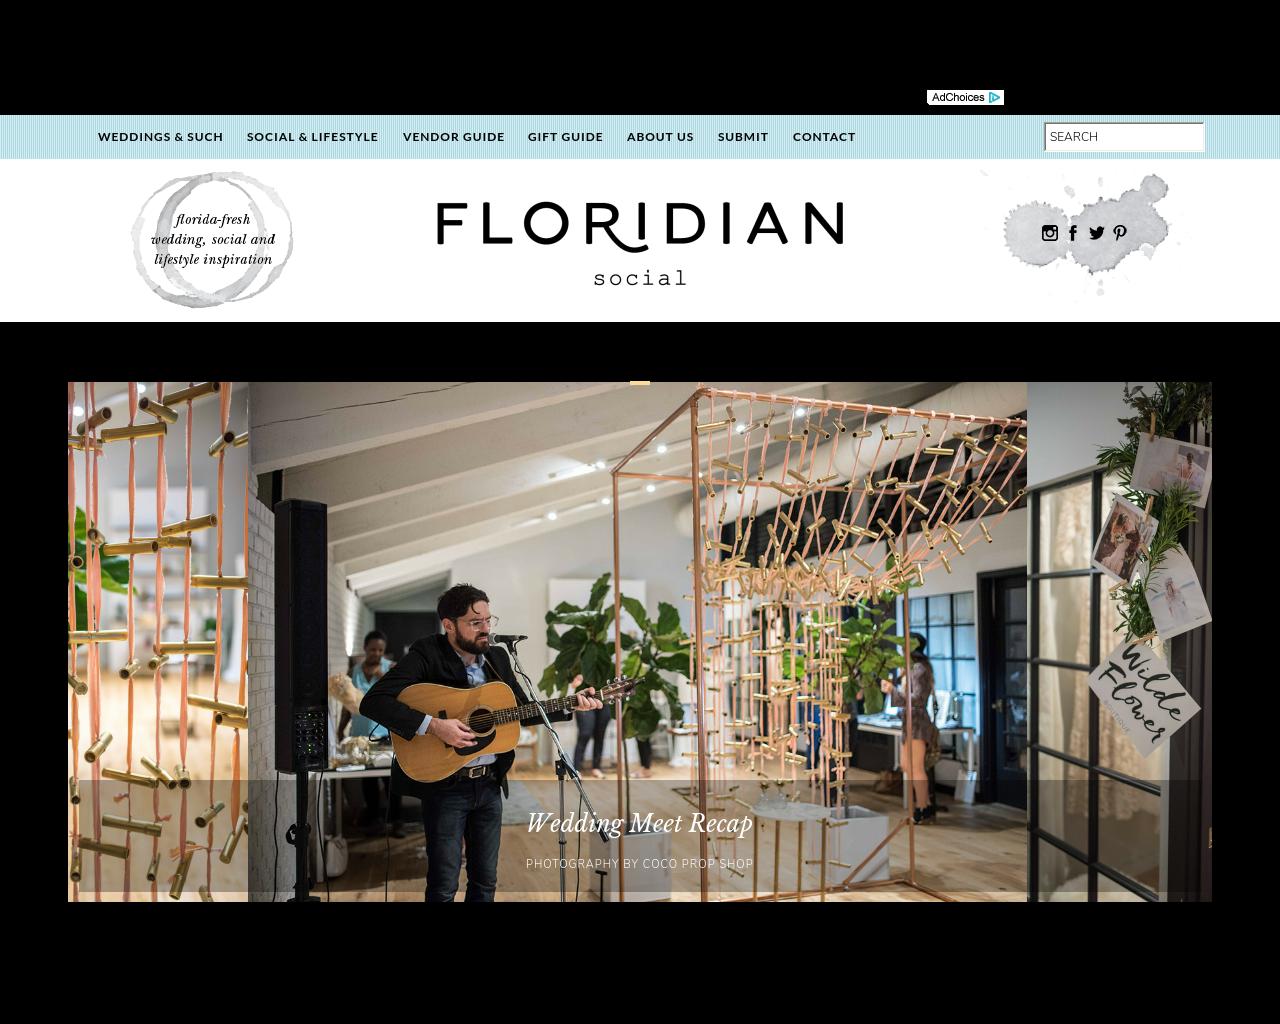 Floridian-Weddings-Advertising-Reviews-Pricing